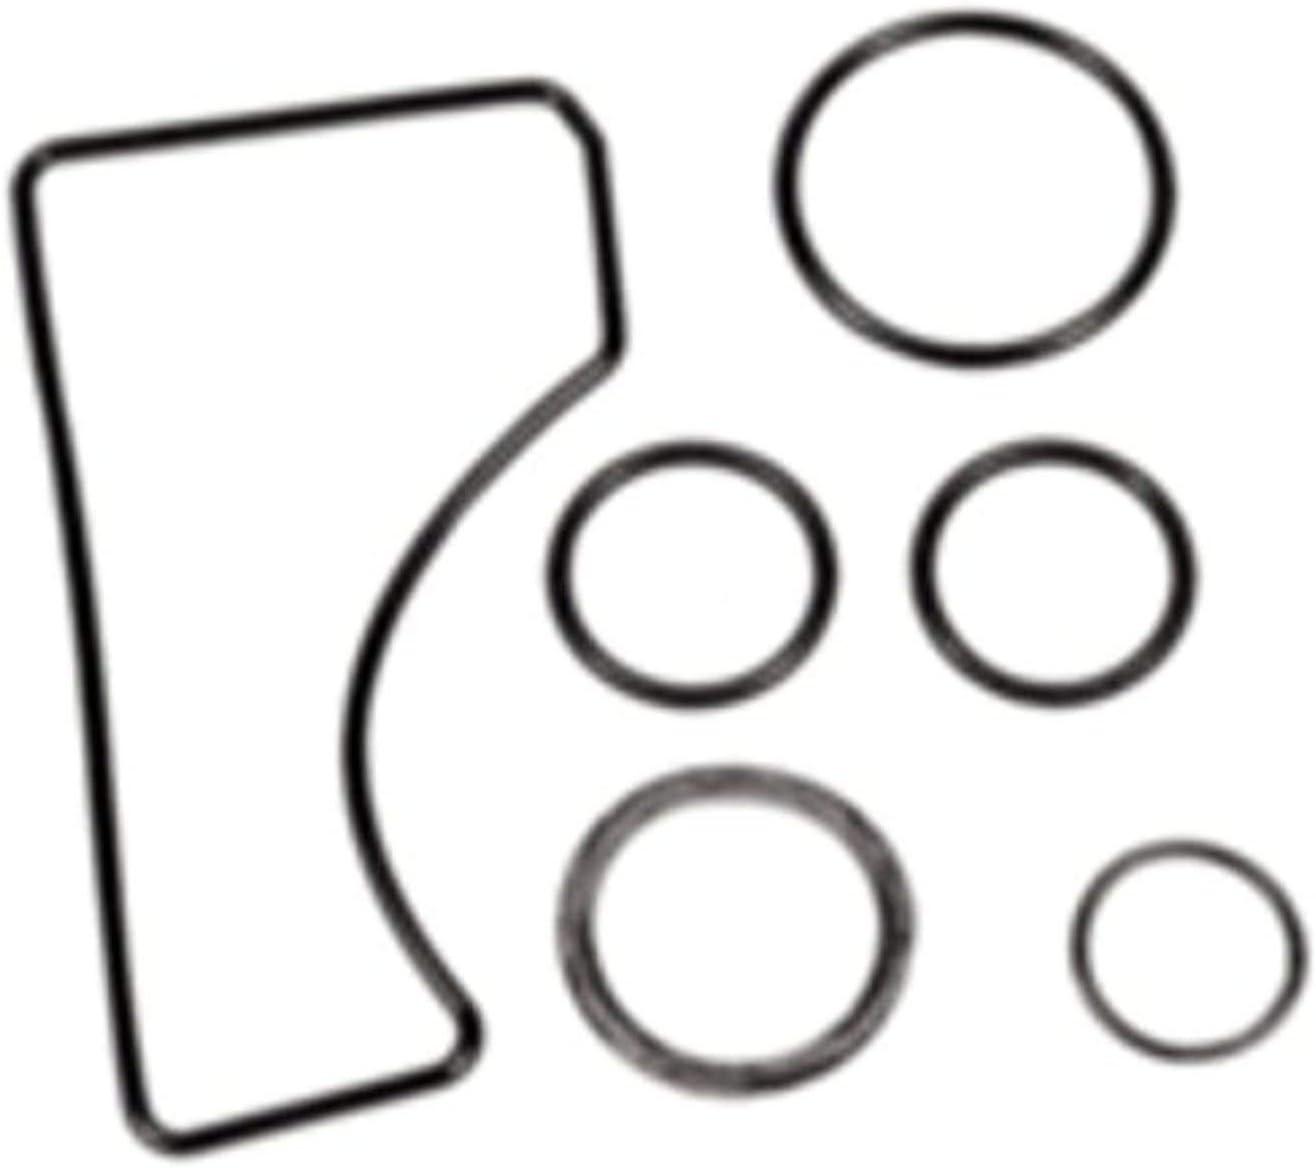 Gaskets Engine Kit Gasket Sets MerCruiser Bravo Drives Quicksilver ...